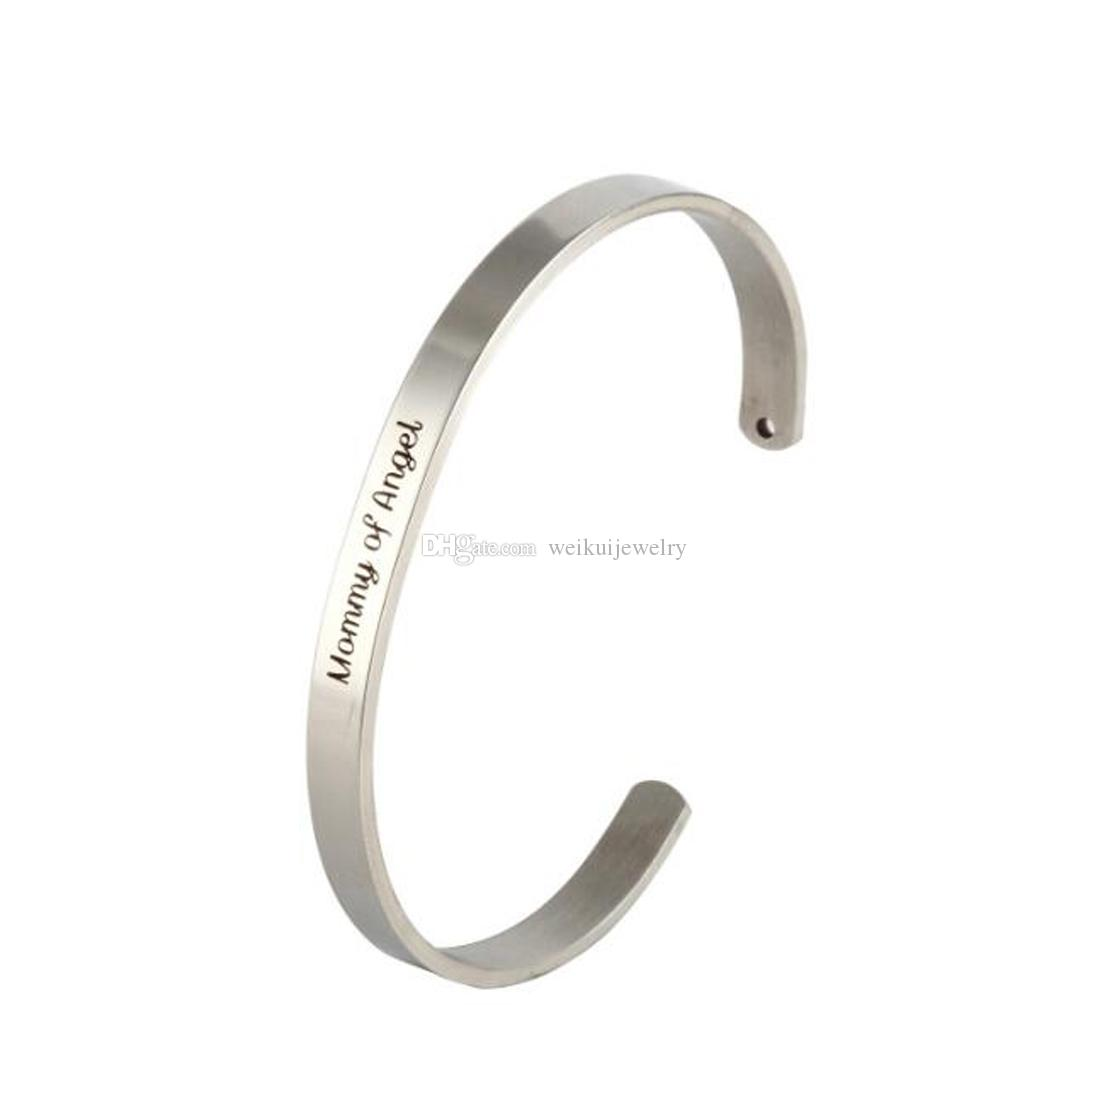 Fashion Lettering Silver Cuff Bracelet Brazalete de acero inoxidable Regalo inspirador para mamá - Mamá, mi ángel